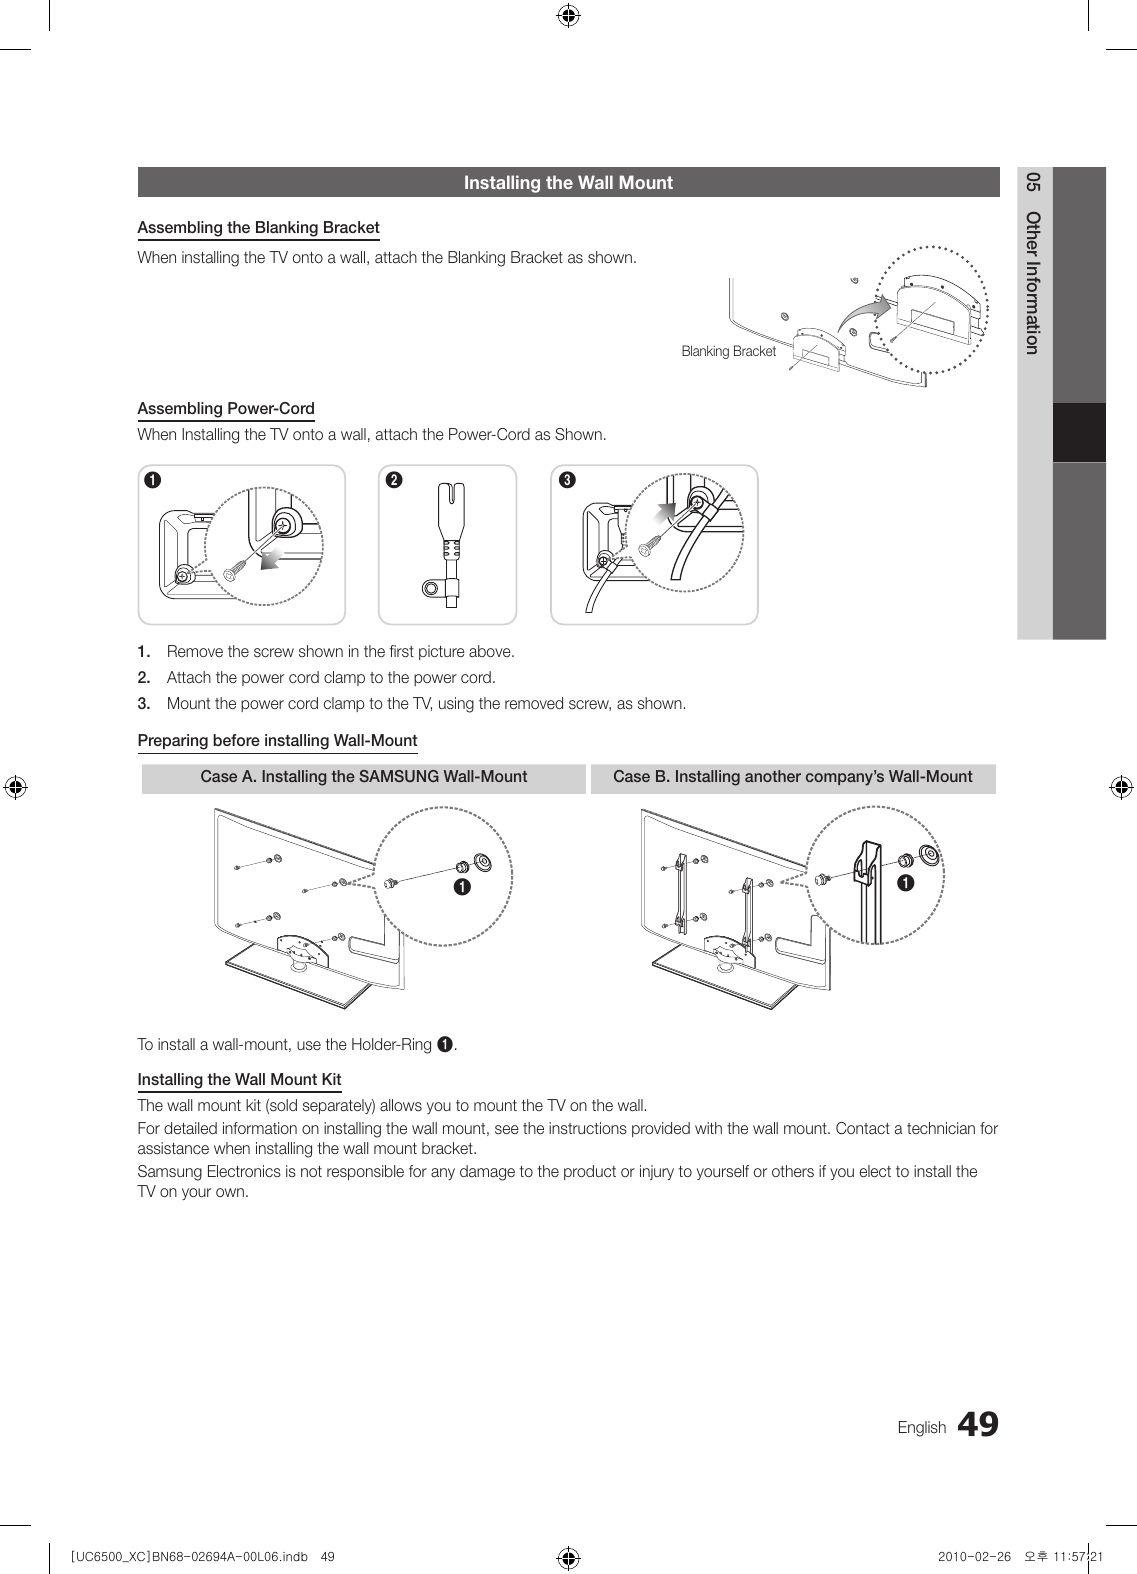 Samsung Ue32C6500 Users Manual on